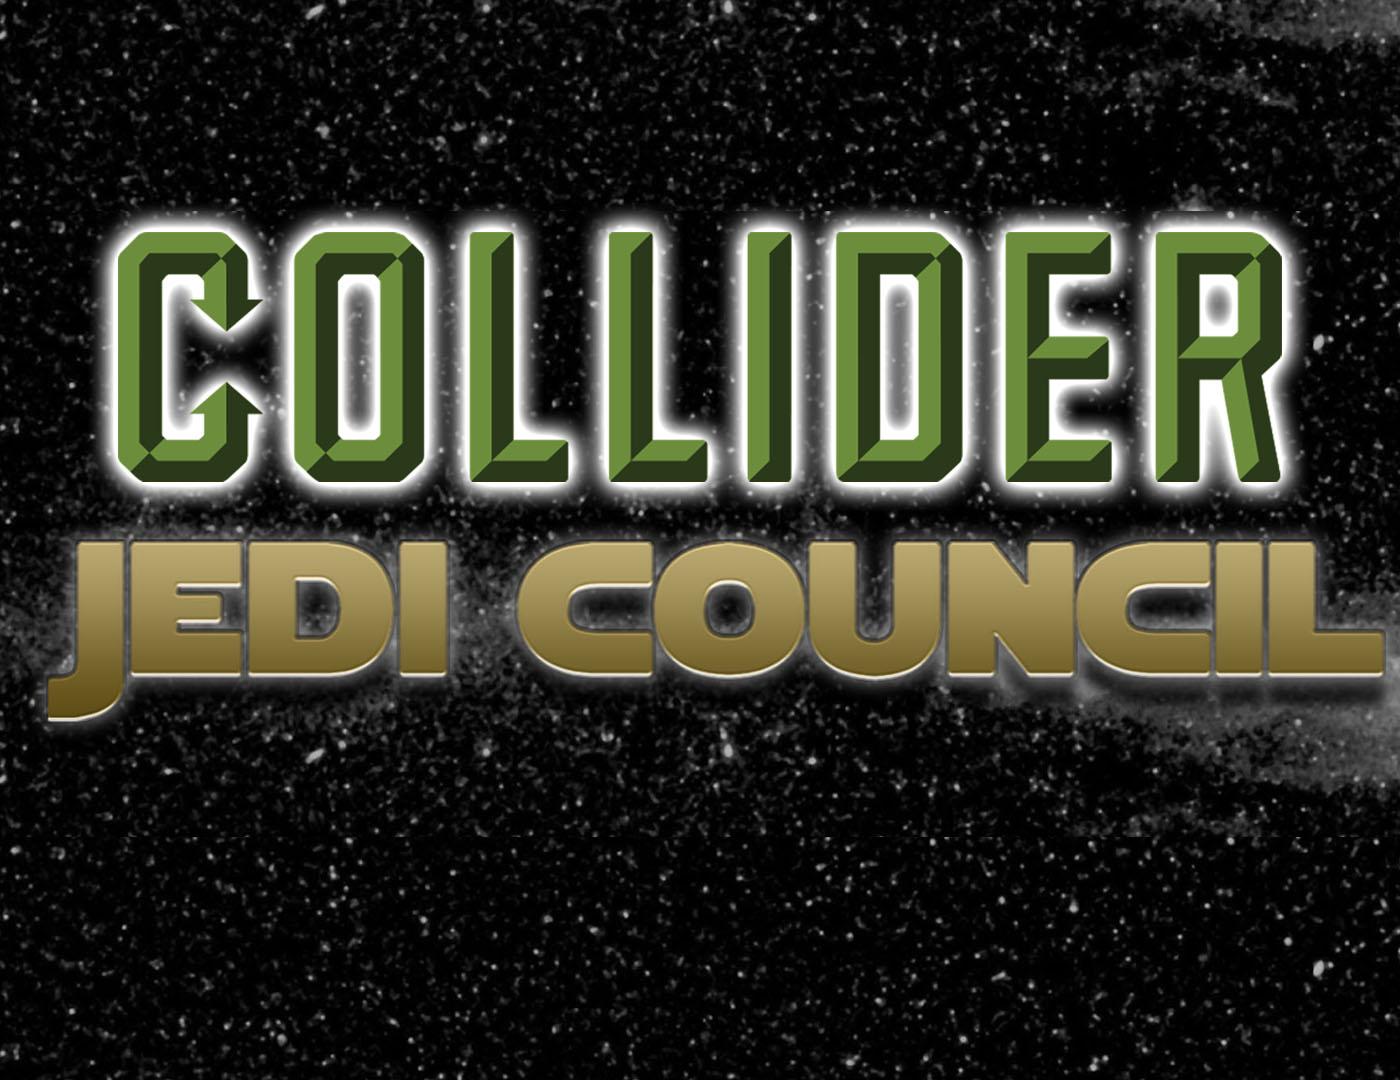 Episode 8 Trailer Premiere Date Confirmed? - Collider Jedi Council